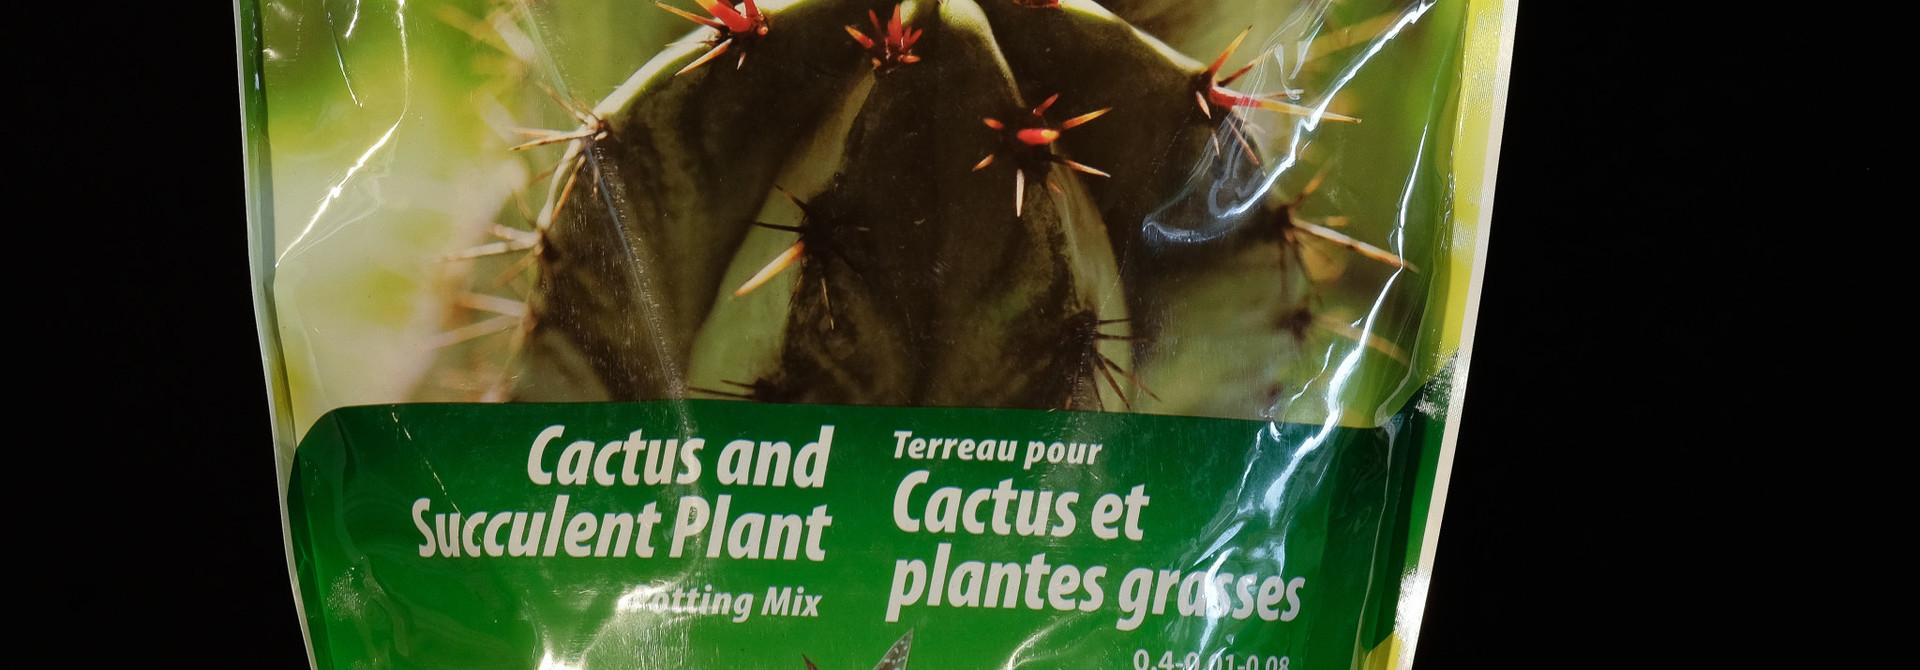 Terreau cactus et plantes grasses